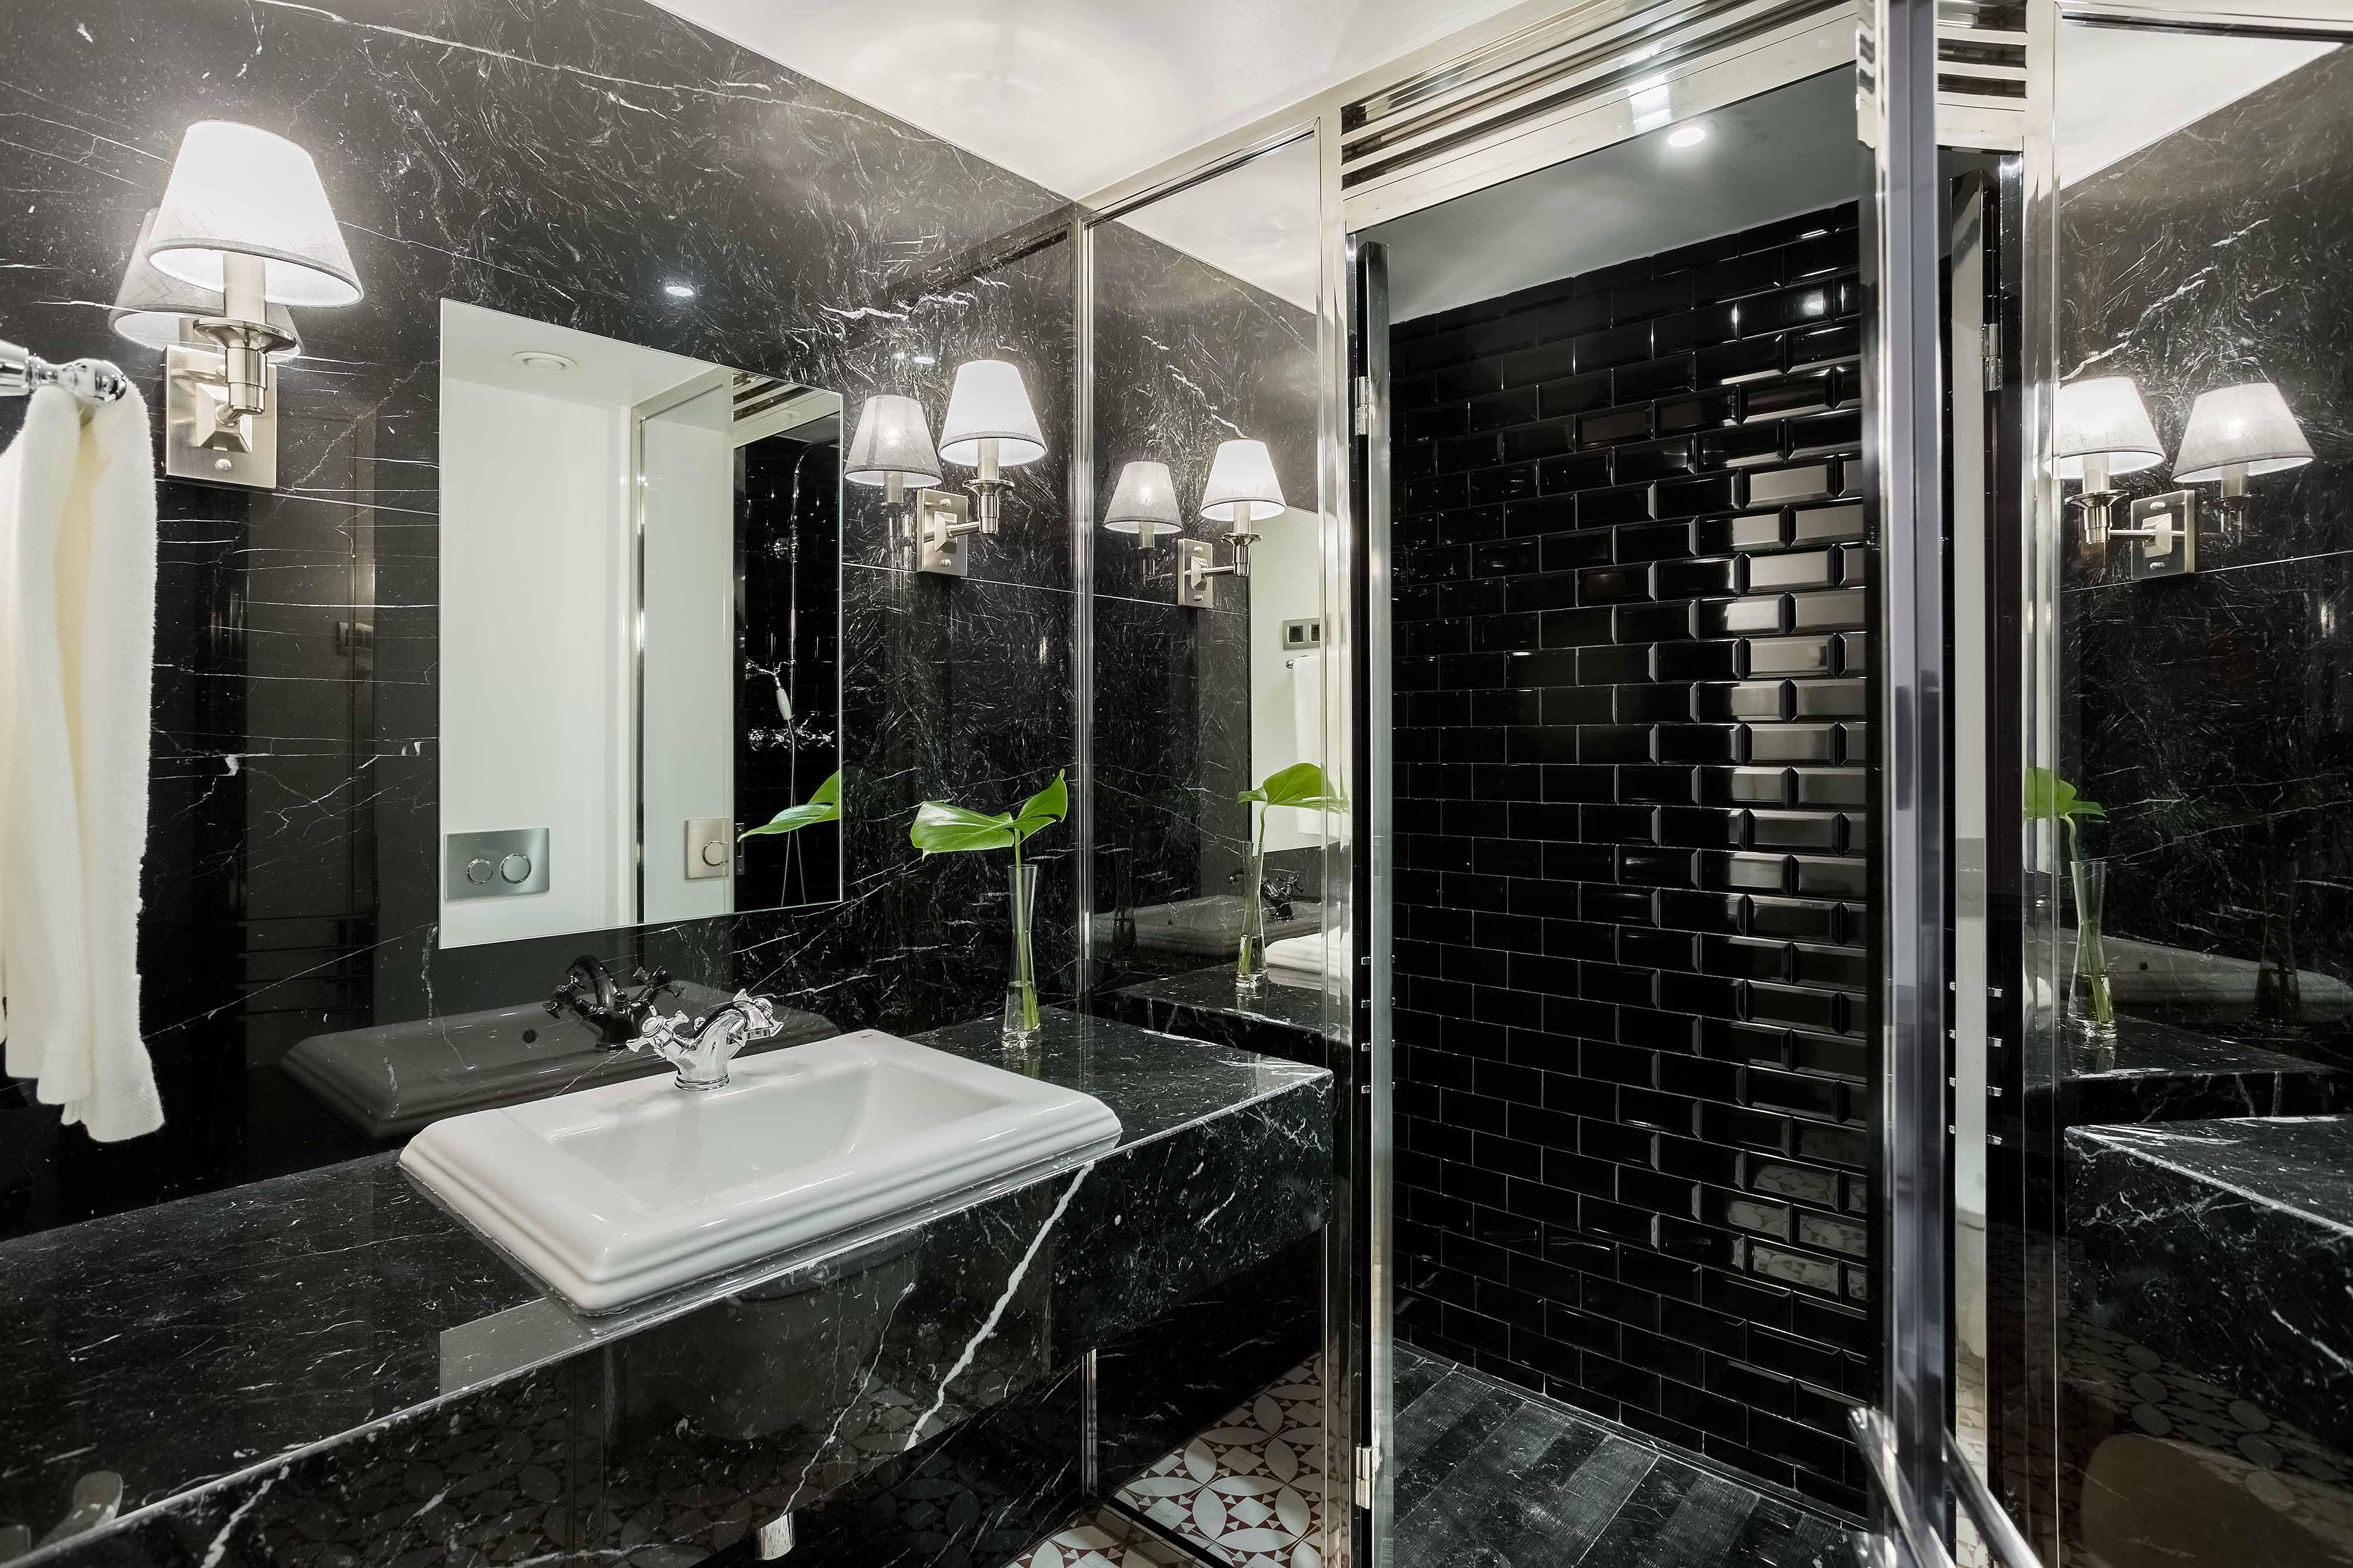 Room Mate lavabo Barcelona